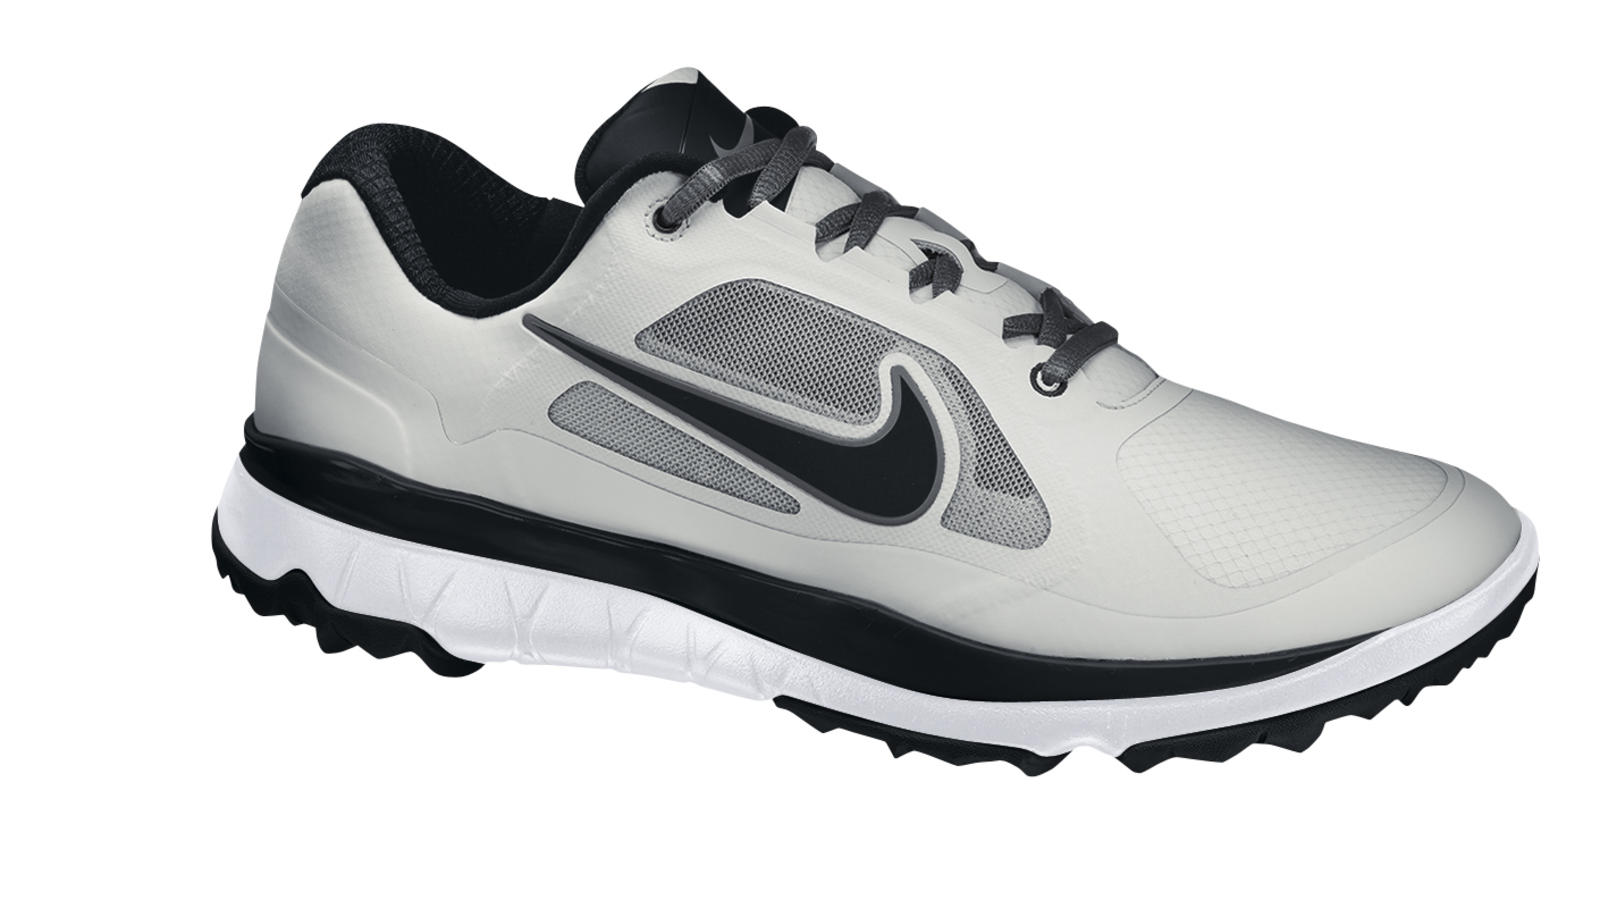 hot sales 07822 9f6d4 Nike FI Impact Light Base Grey-Black